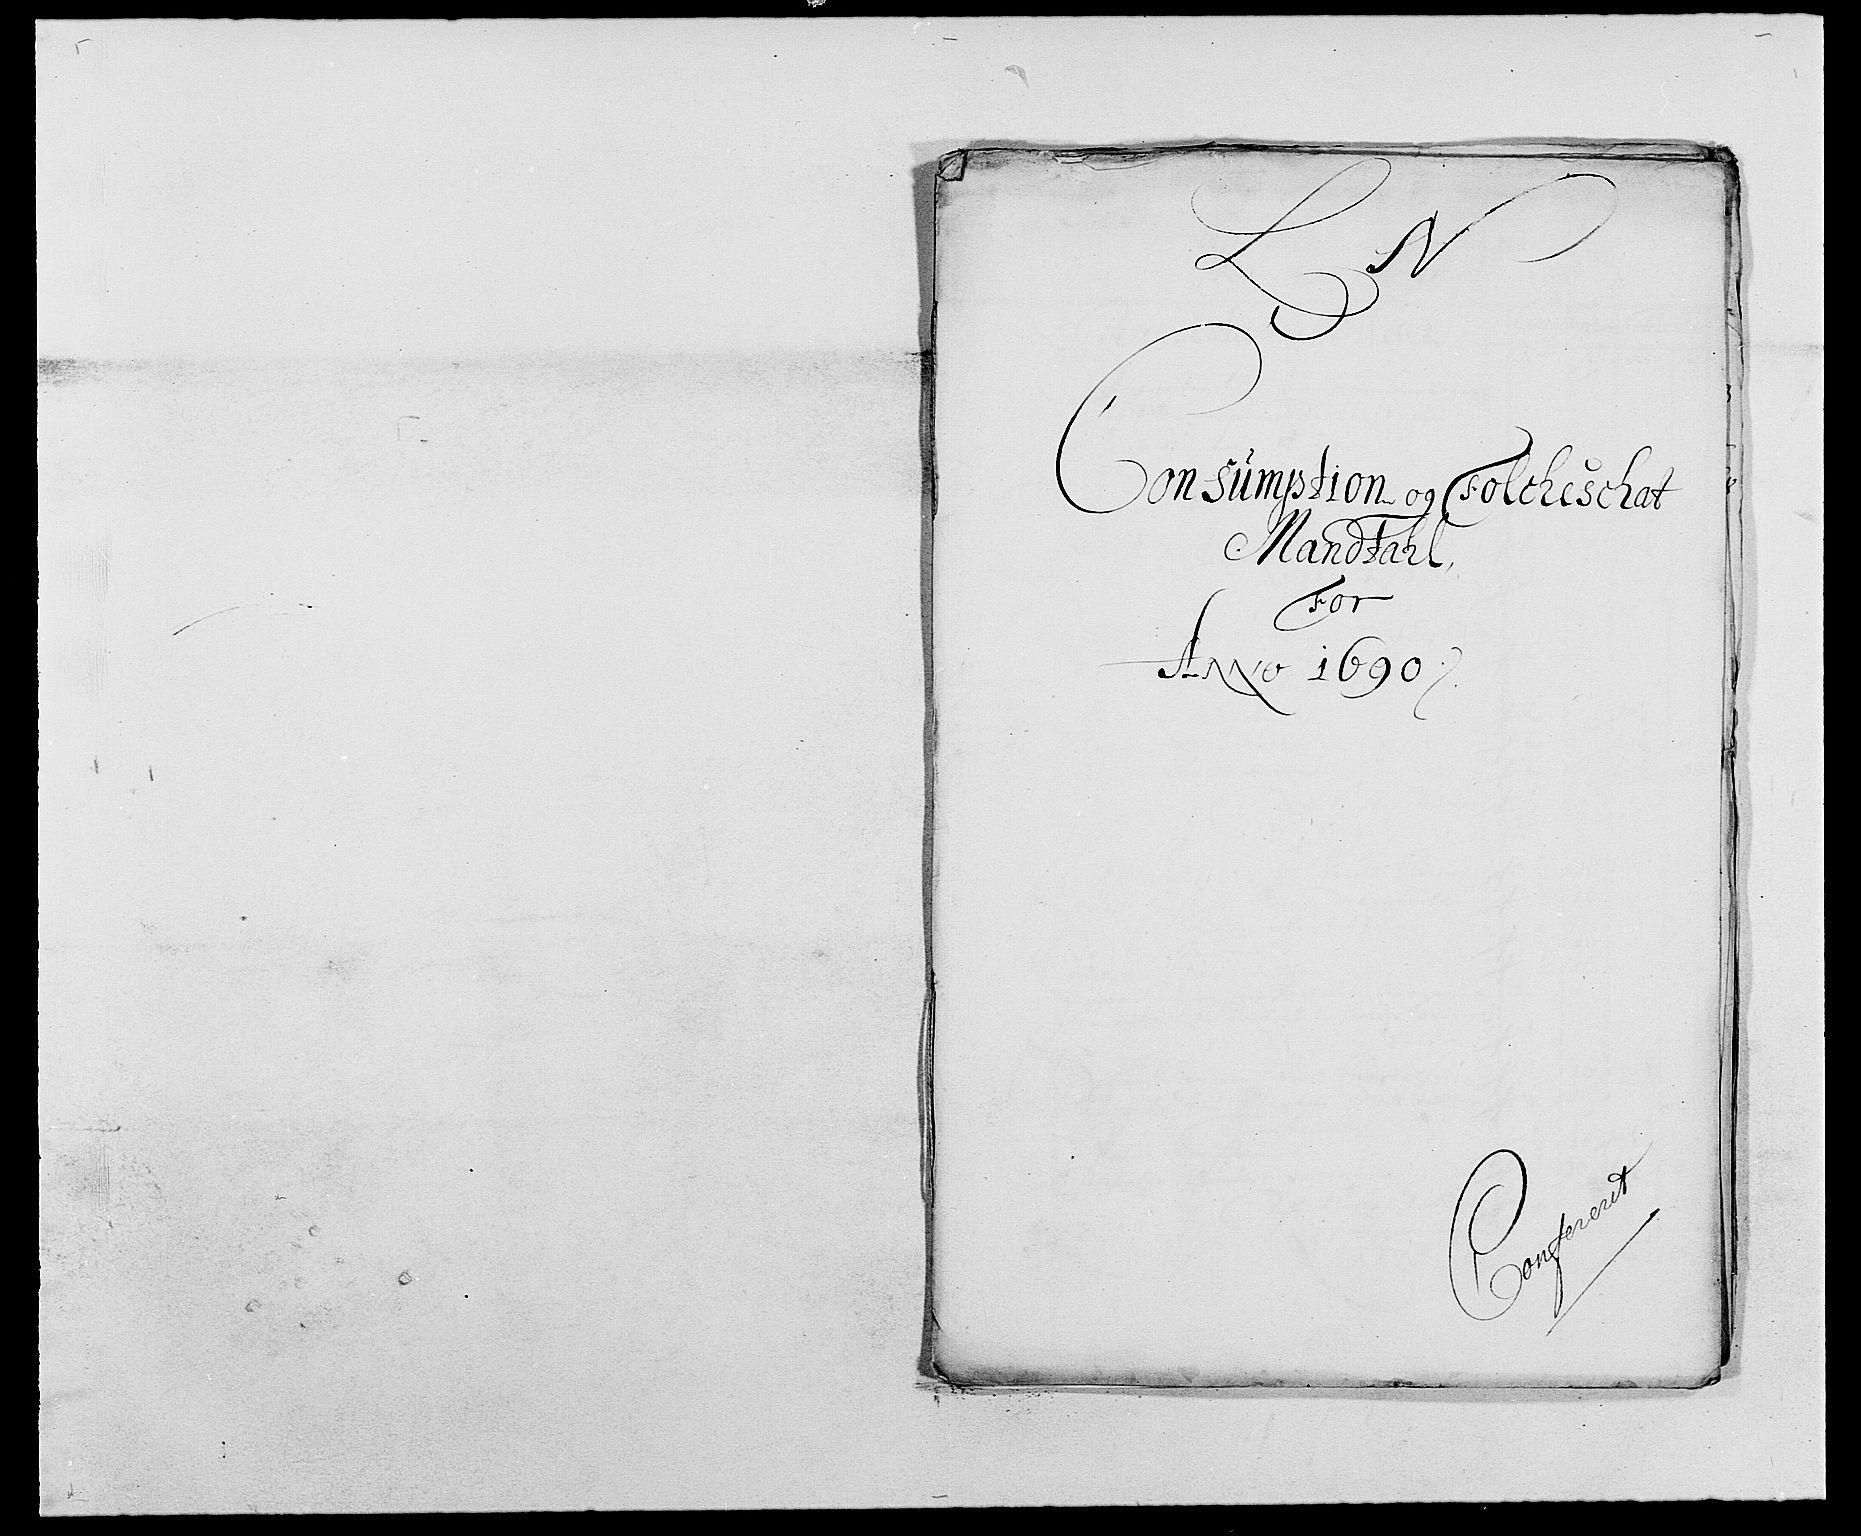 RA, Rentekammeret inntil 1814, Reviderte regnskaper, Fogderegnskap, R05/L0277: Fogderegnskap Rakkestad, 1689-1690, s. 270